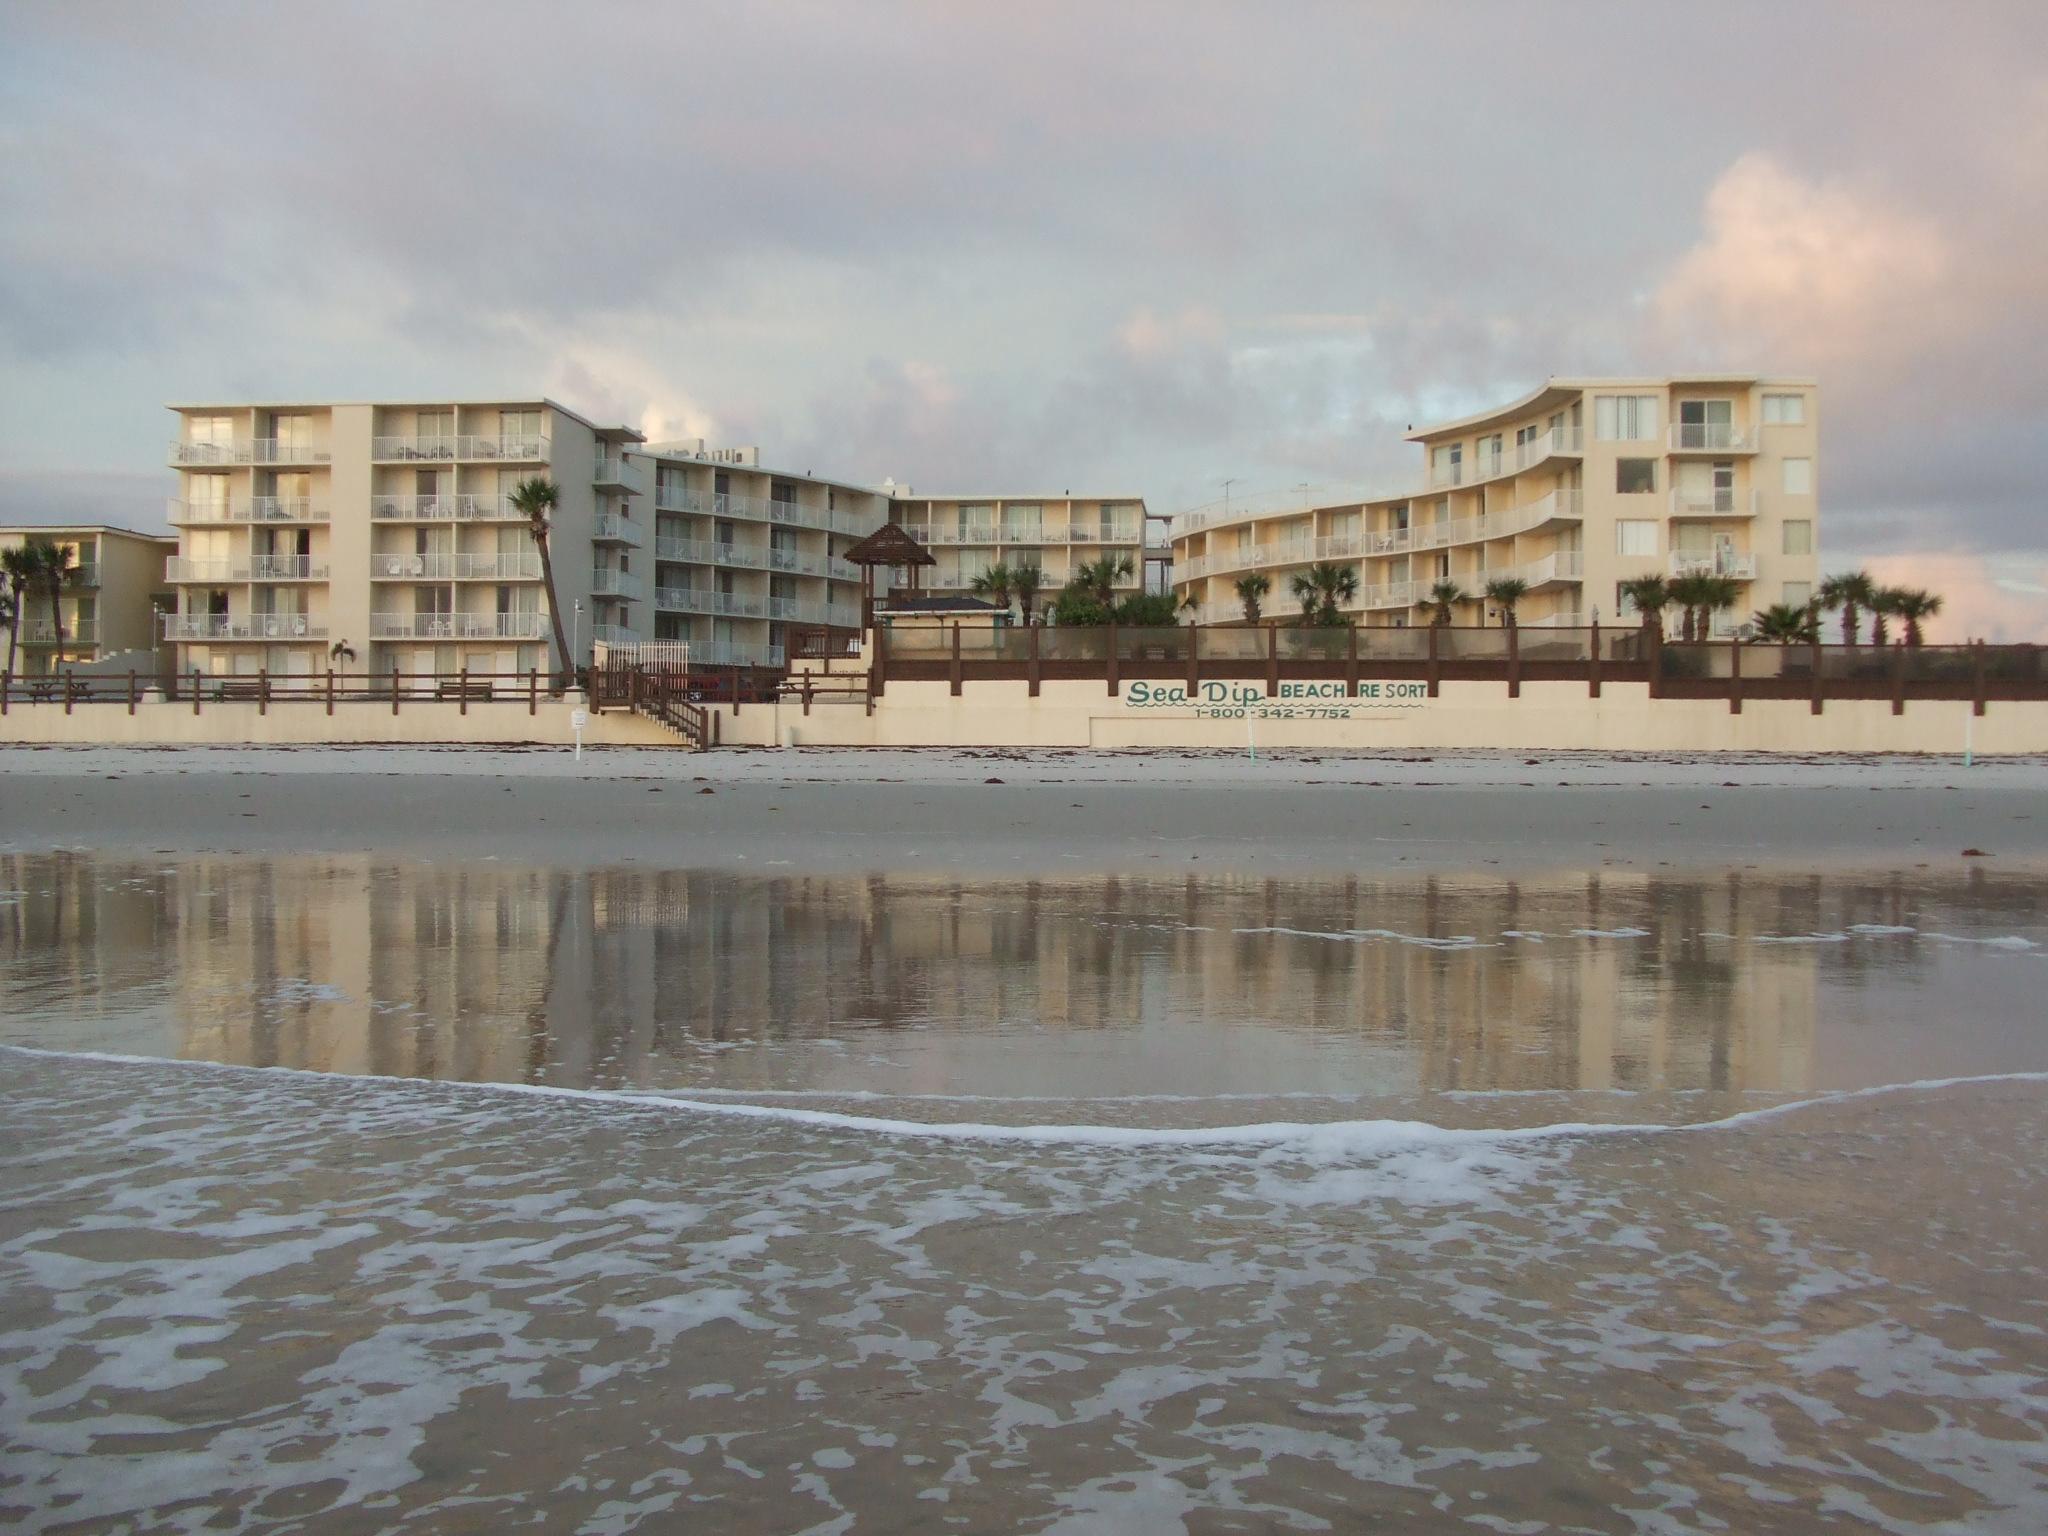 Sea Dip Beach Resort and Condominiums